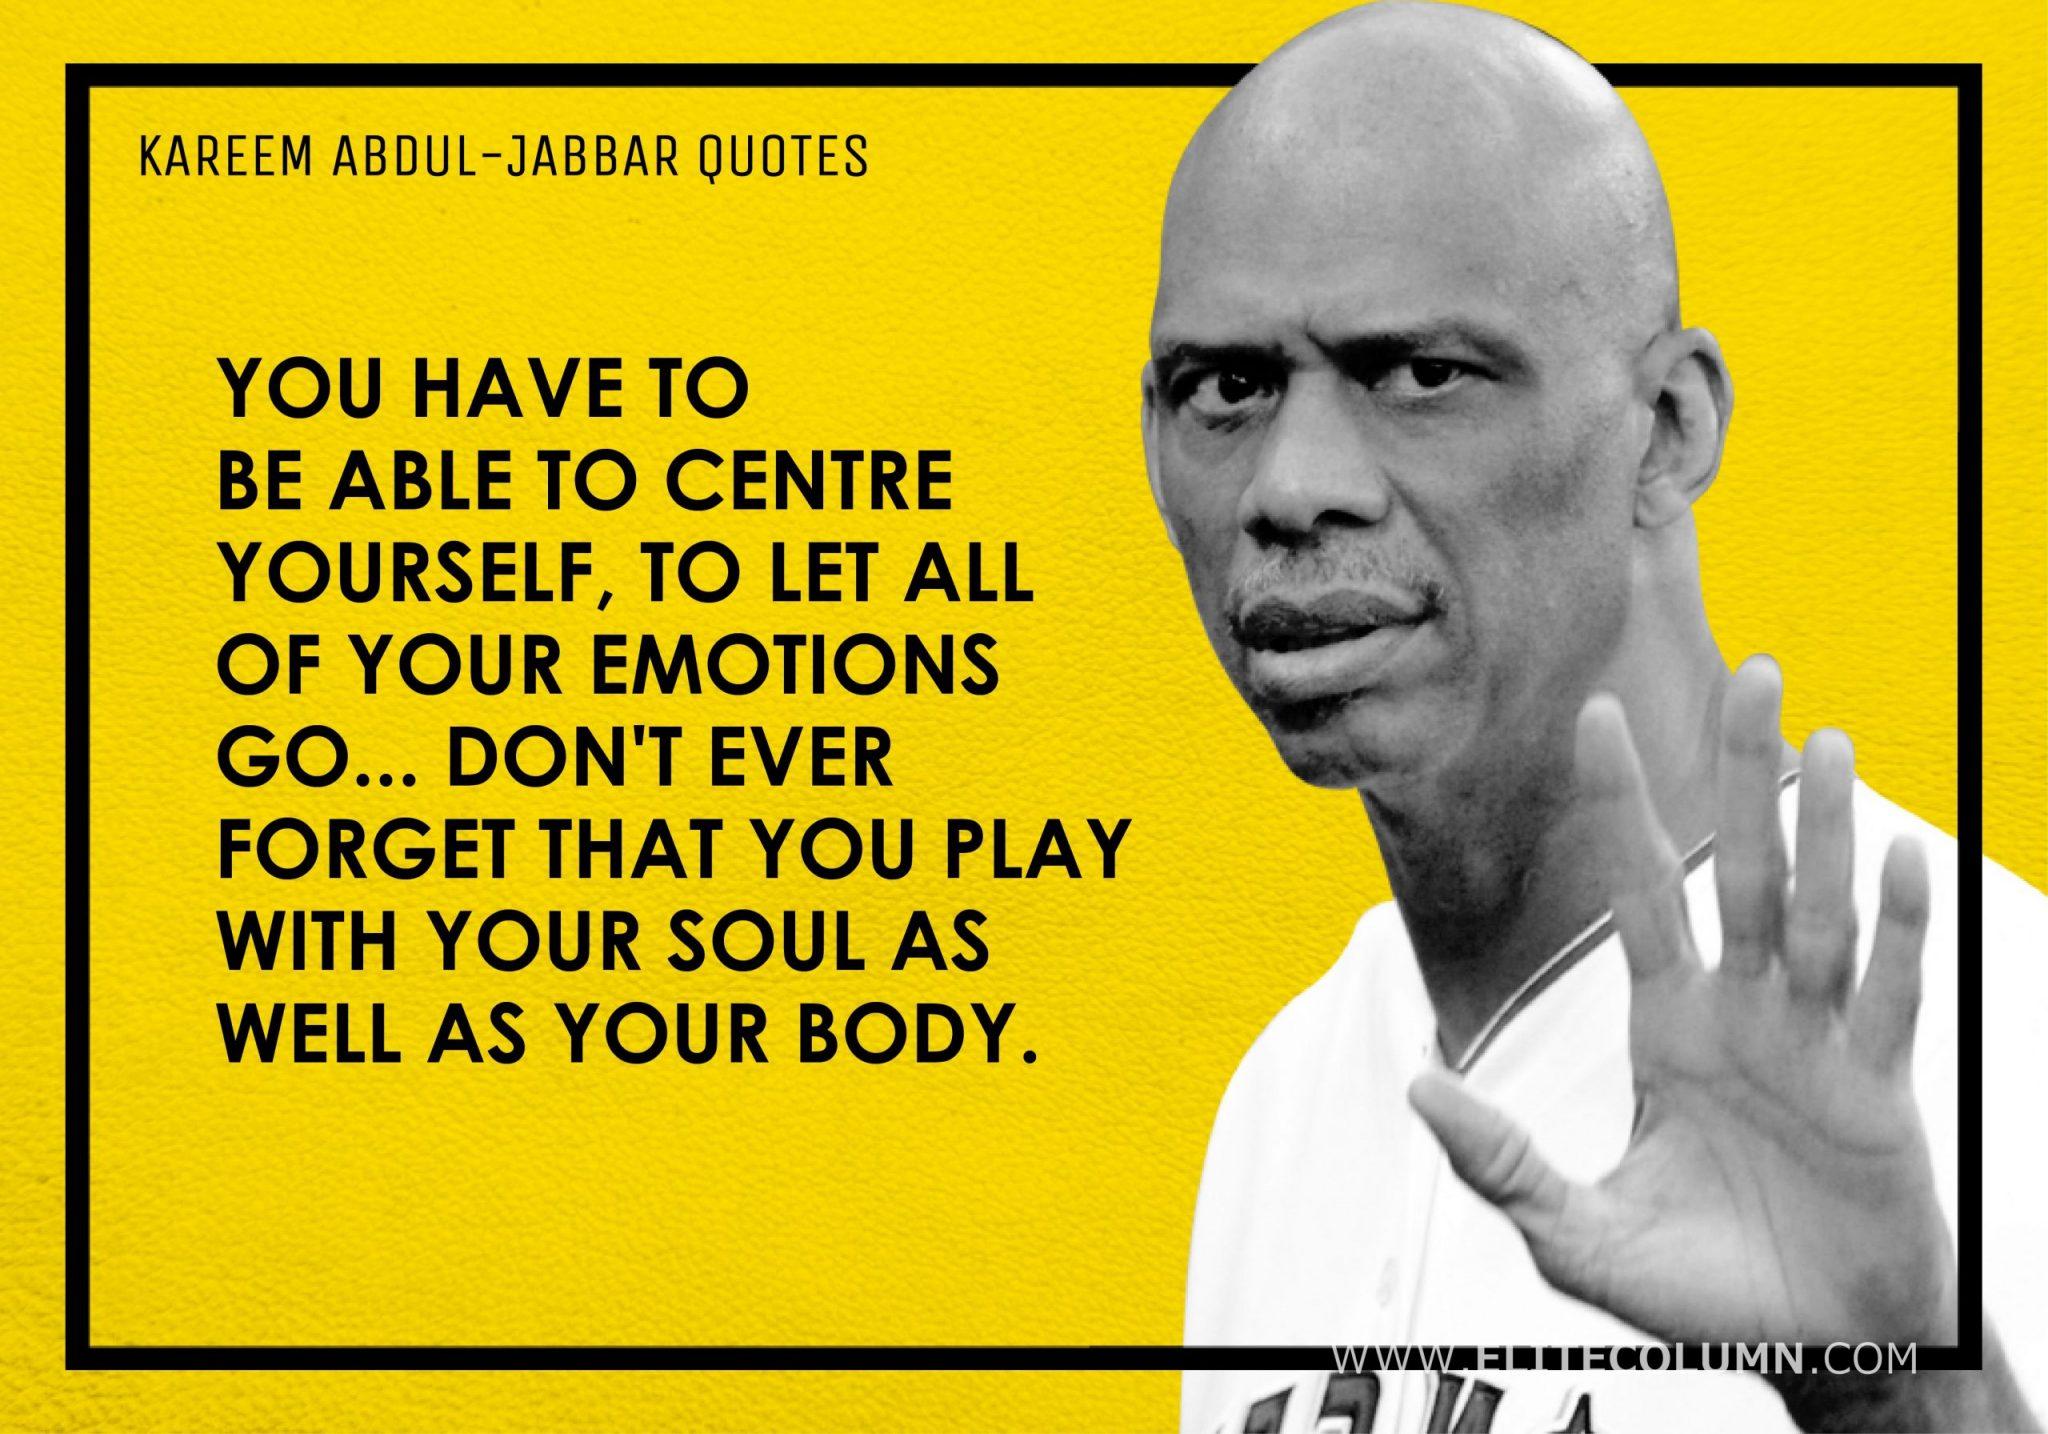 Kareem Abdul-Jabbar Quotes (2)